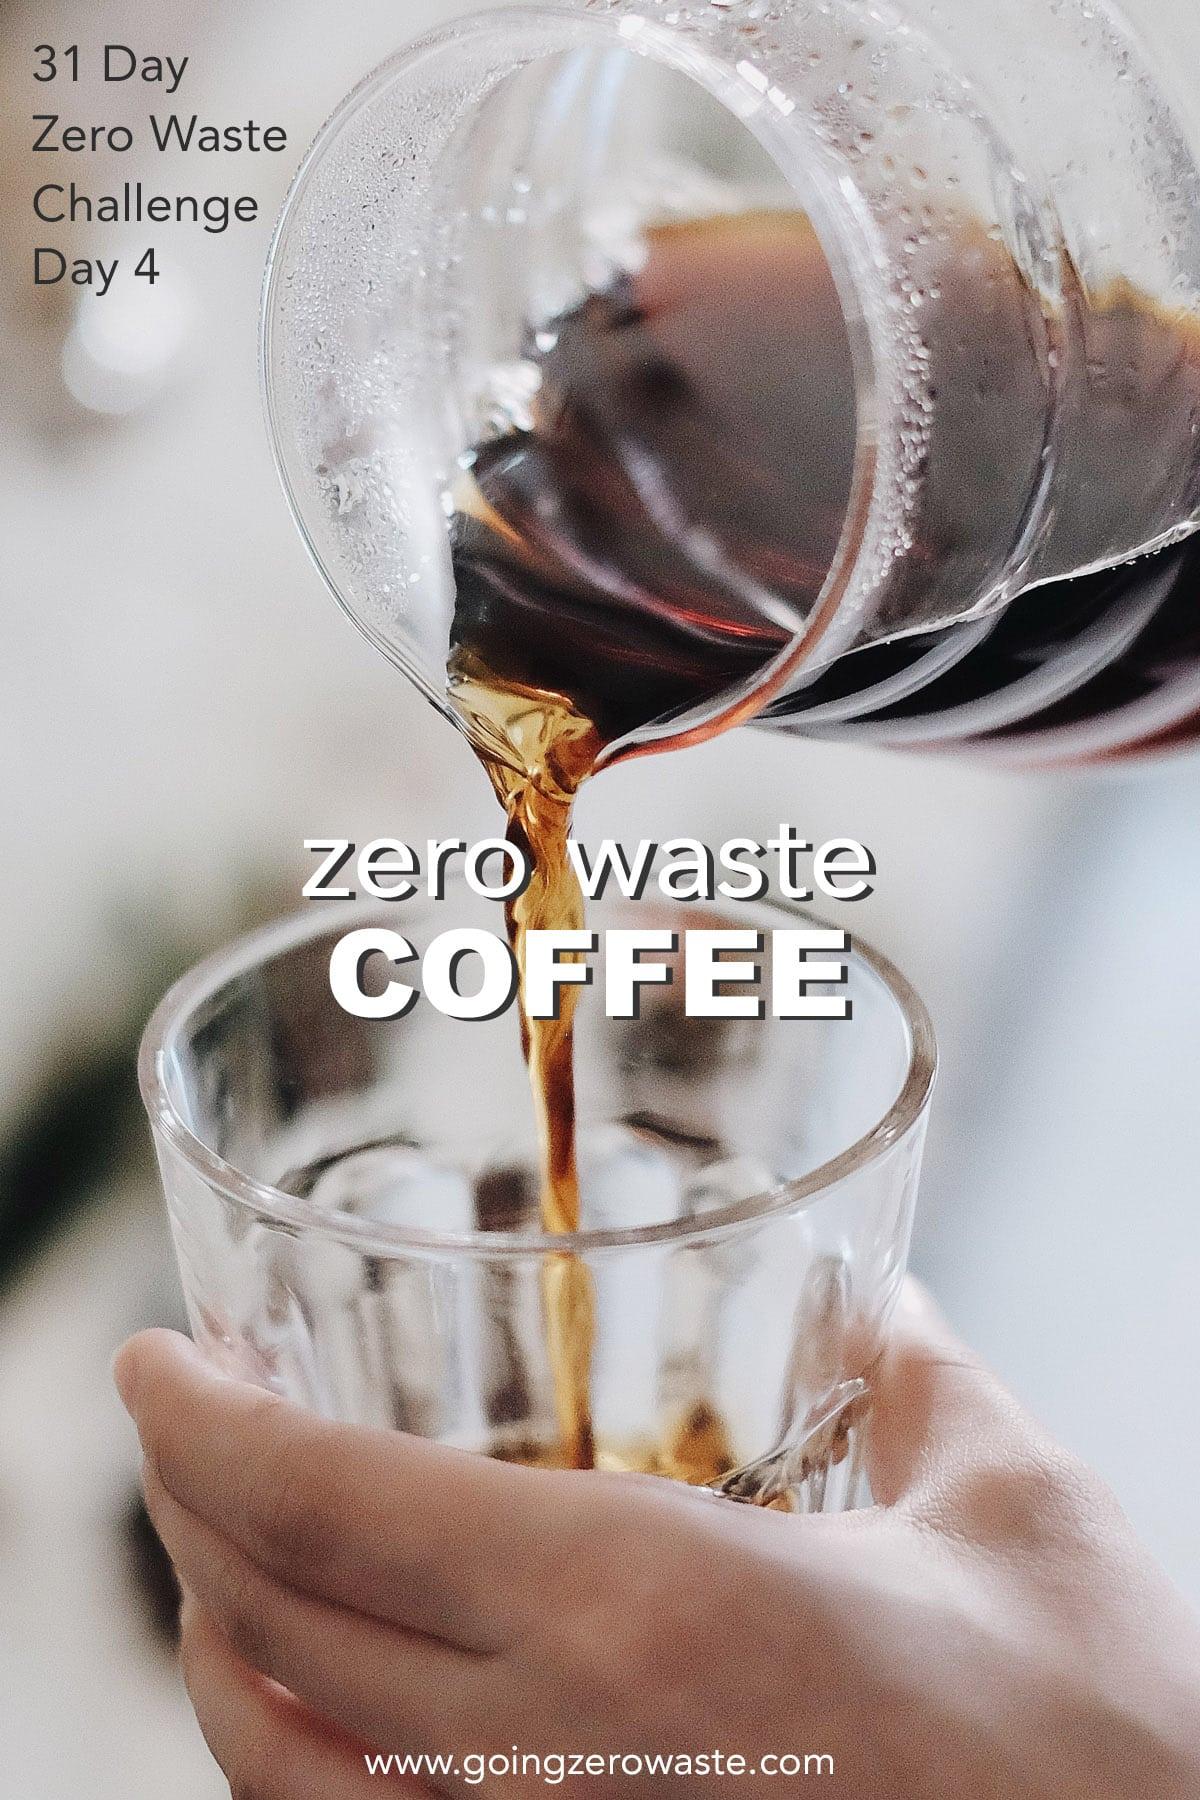 Zero Waste Coffee - Day 4 of the Zero Waste Challenge from www.goingzerowaste.com #zerowaste #ecofriendly #gogreen #sustainable #zerowastechallenge #challenge #sustainablelivingchallenge #coffee